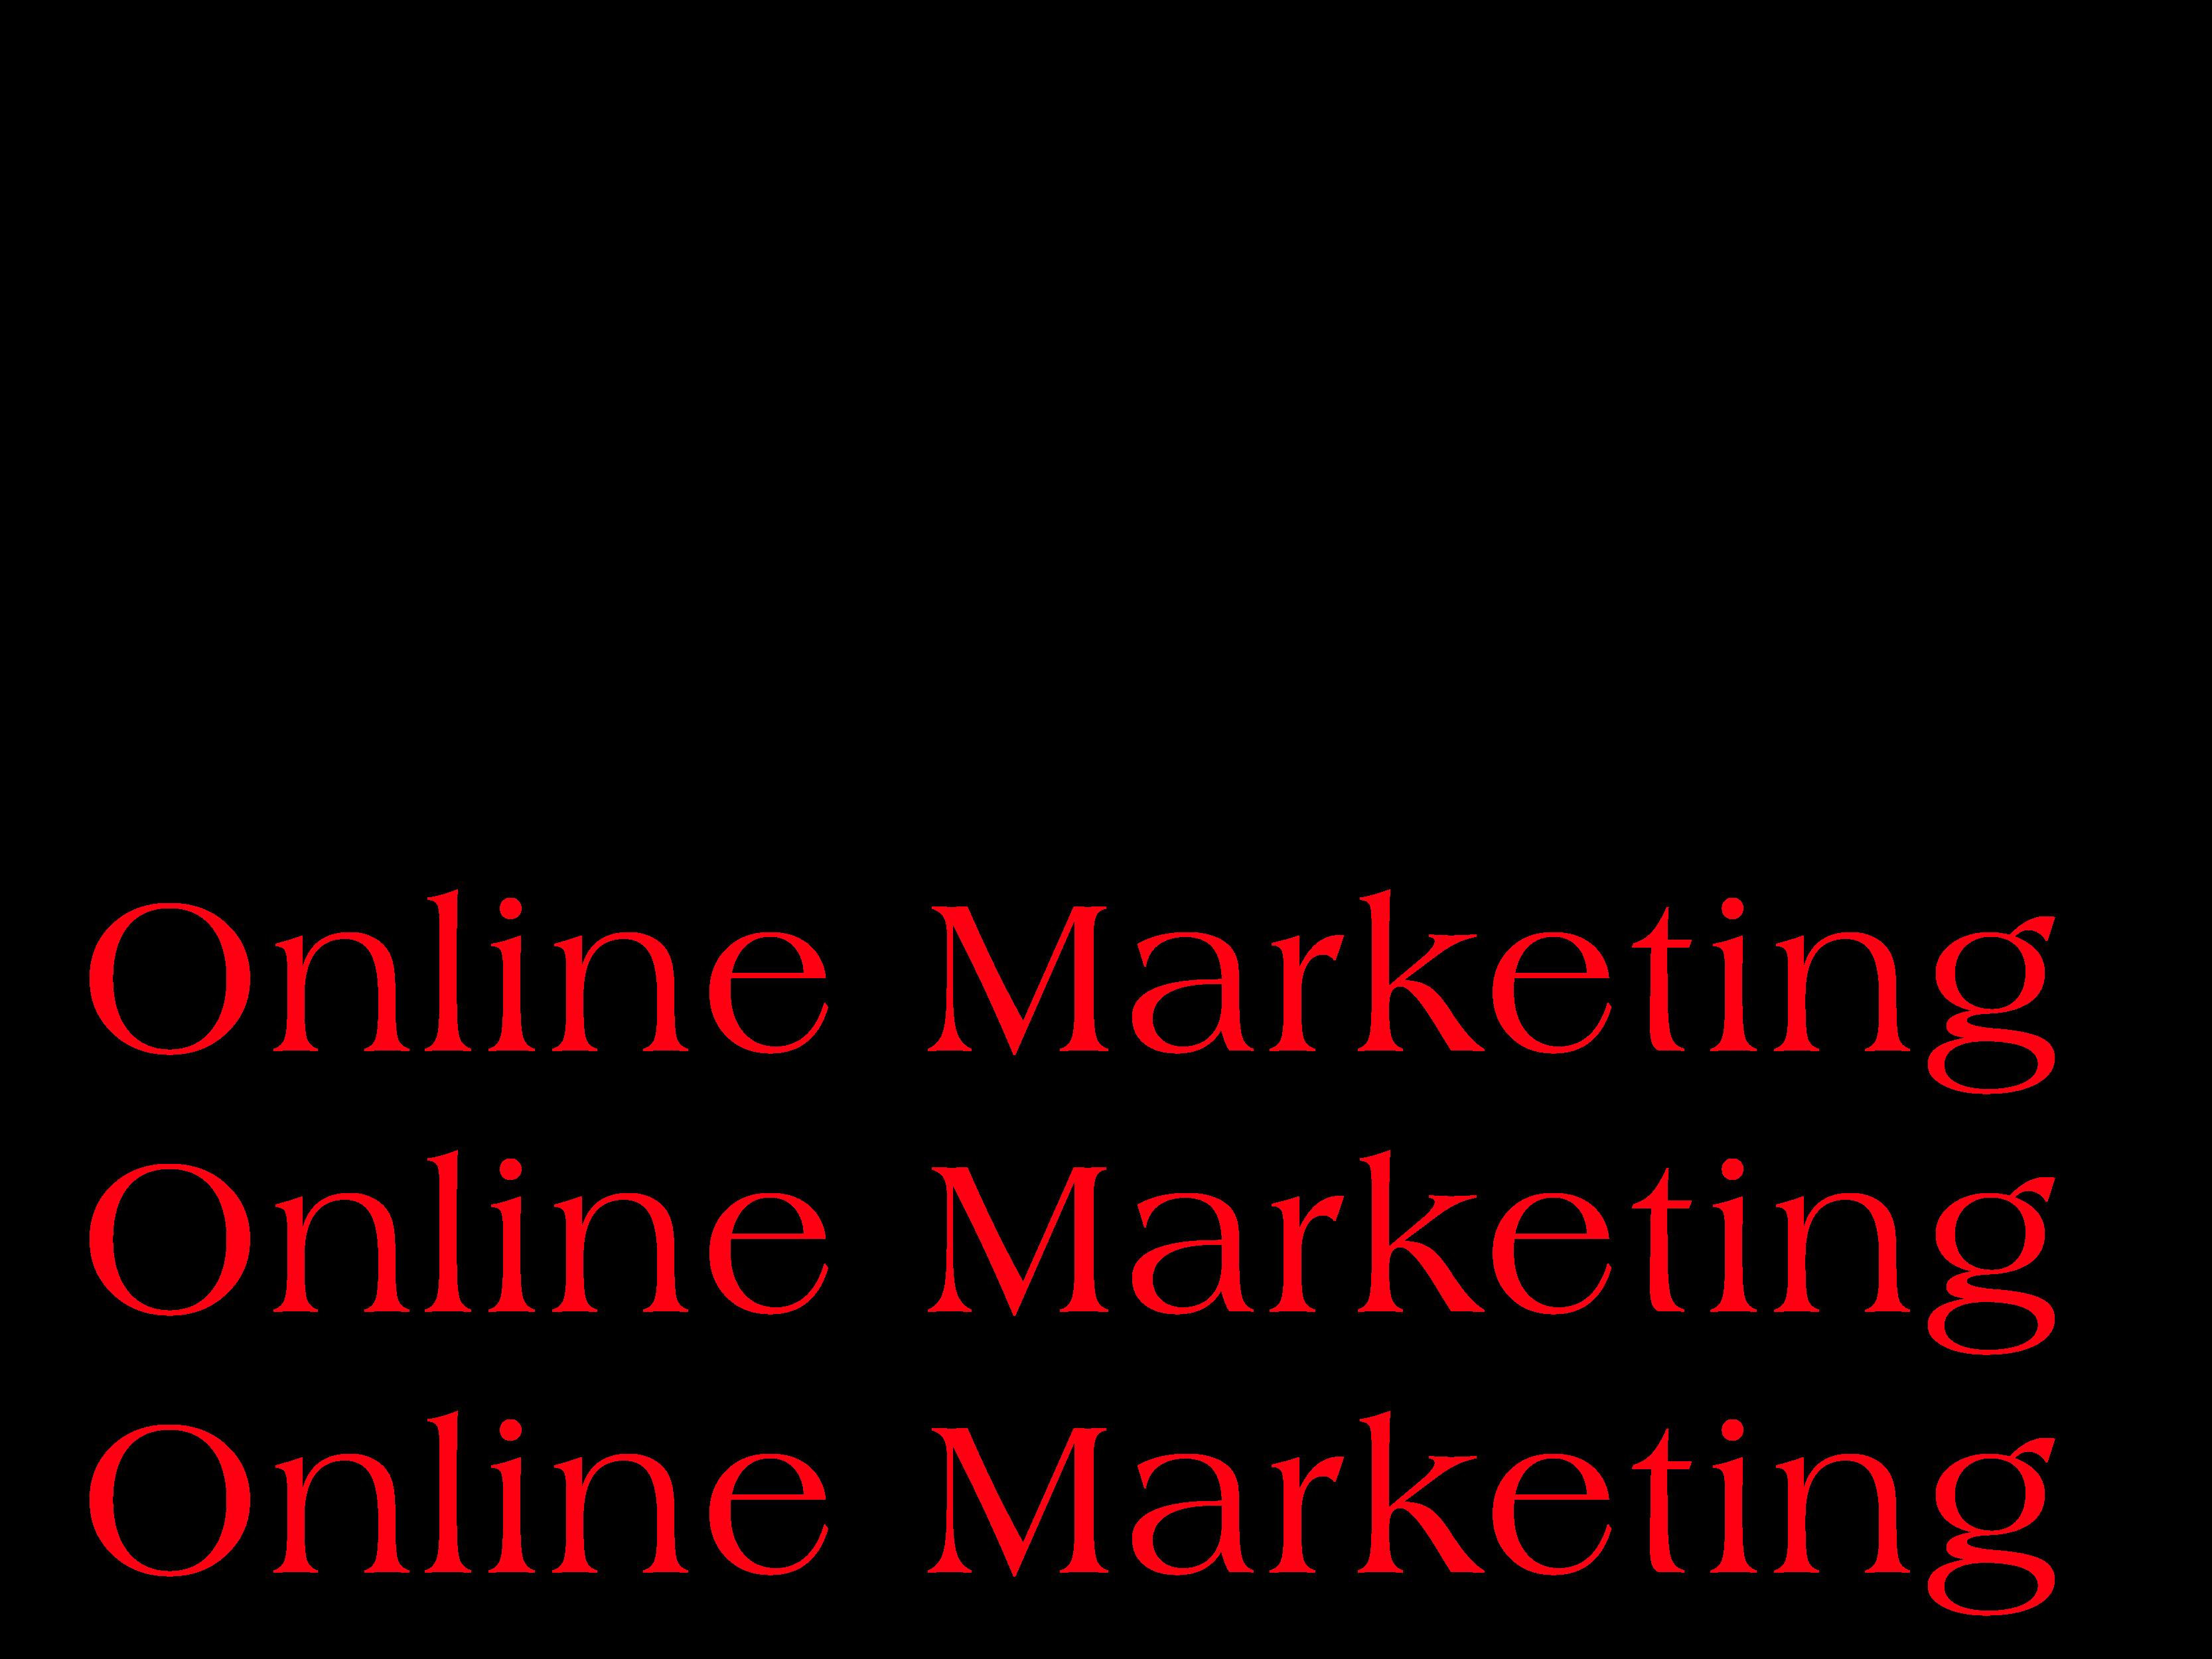 how social media works in marketin pdf since 2015